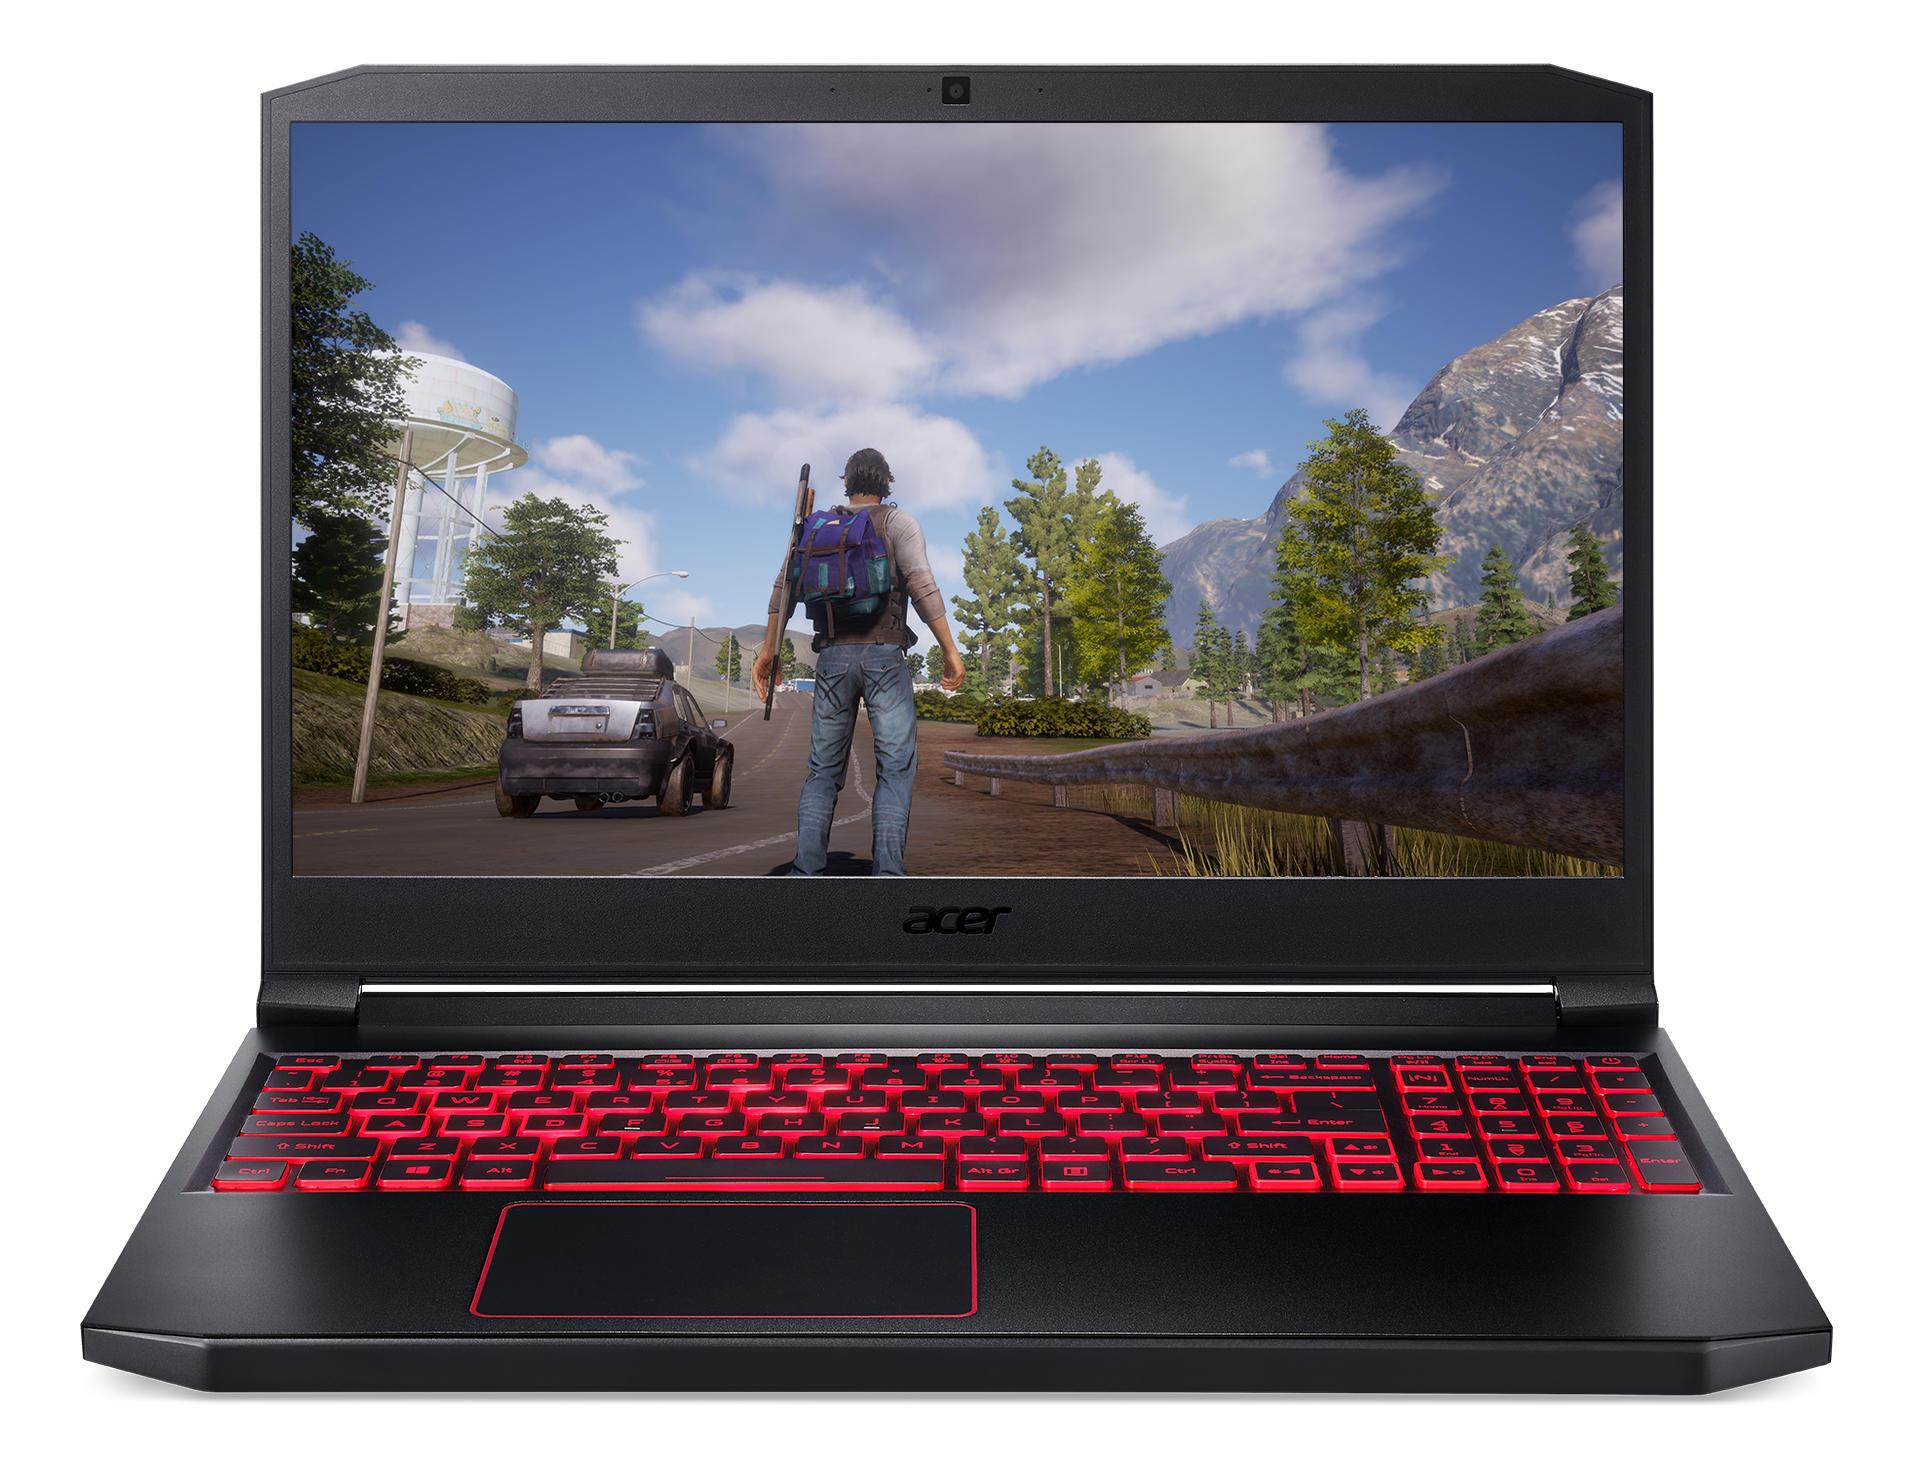 Acer Nitro 7 AN715-52-75GM laptop